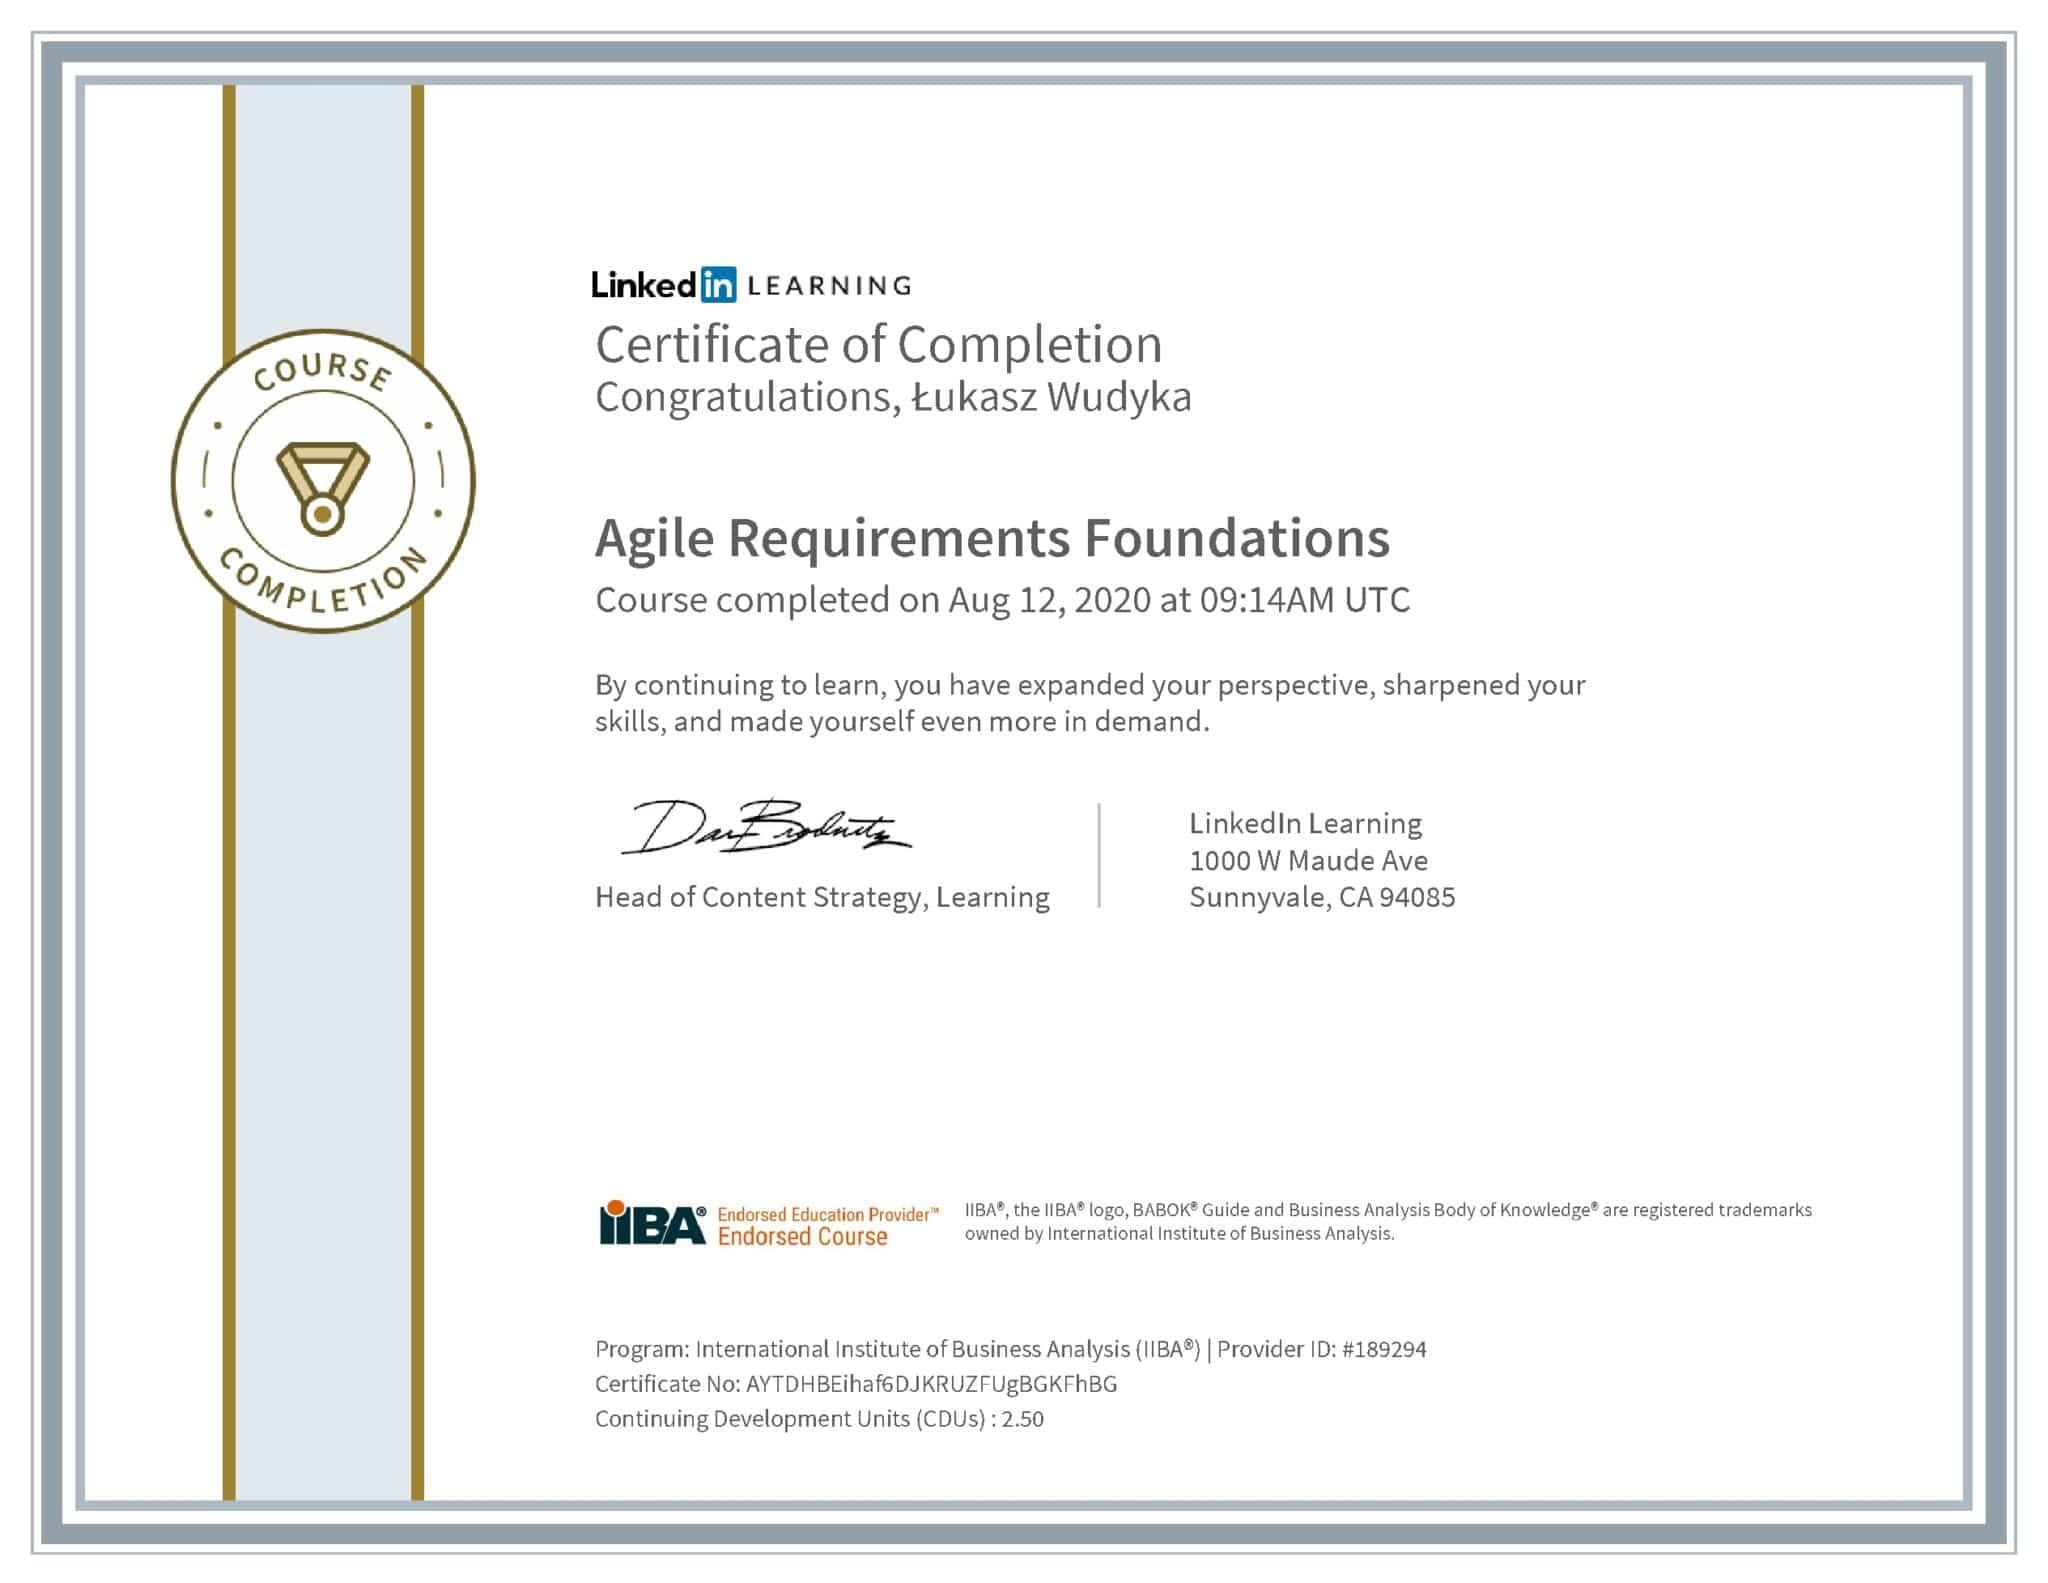 Łukasz Wudyka certyfikat LinkedIn Agile Requirements Foundations IIBA